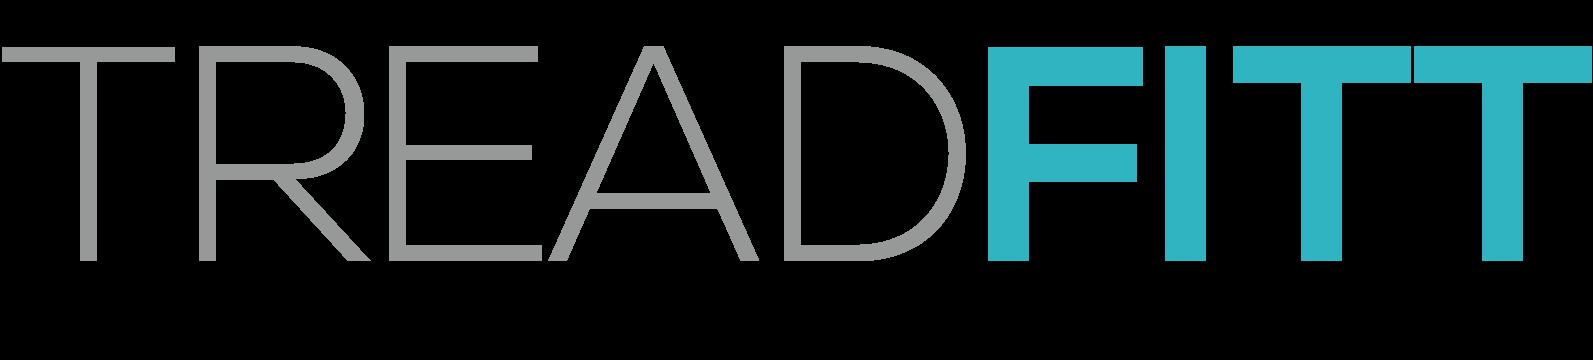 TreadFitt Logo